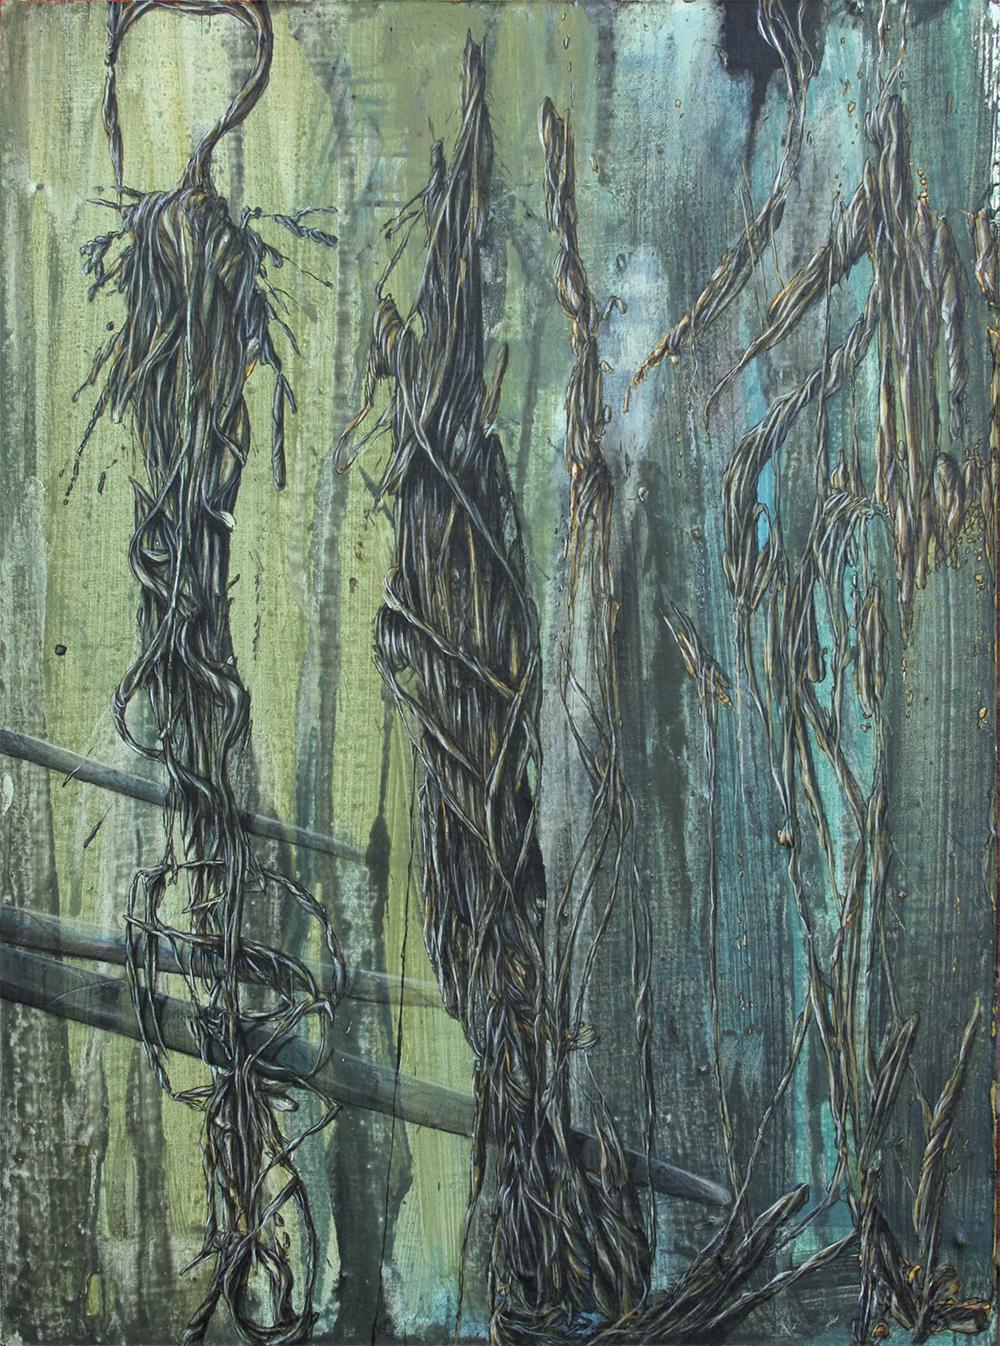 Im Unterholz | Acrylic on wood | 40x29.7cm | 2013